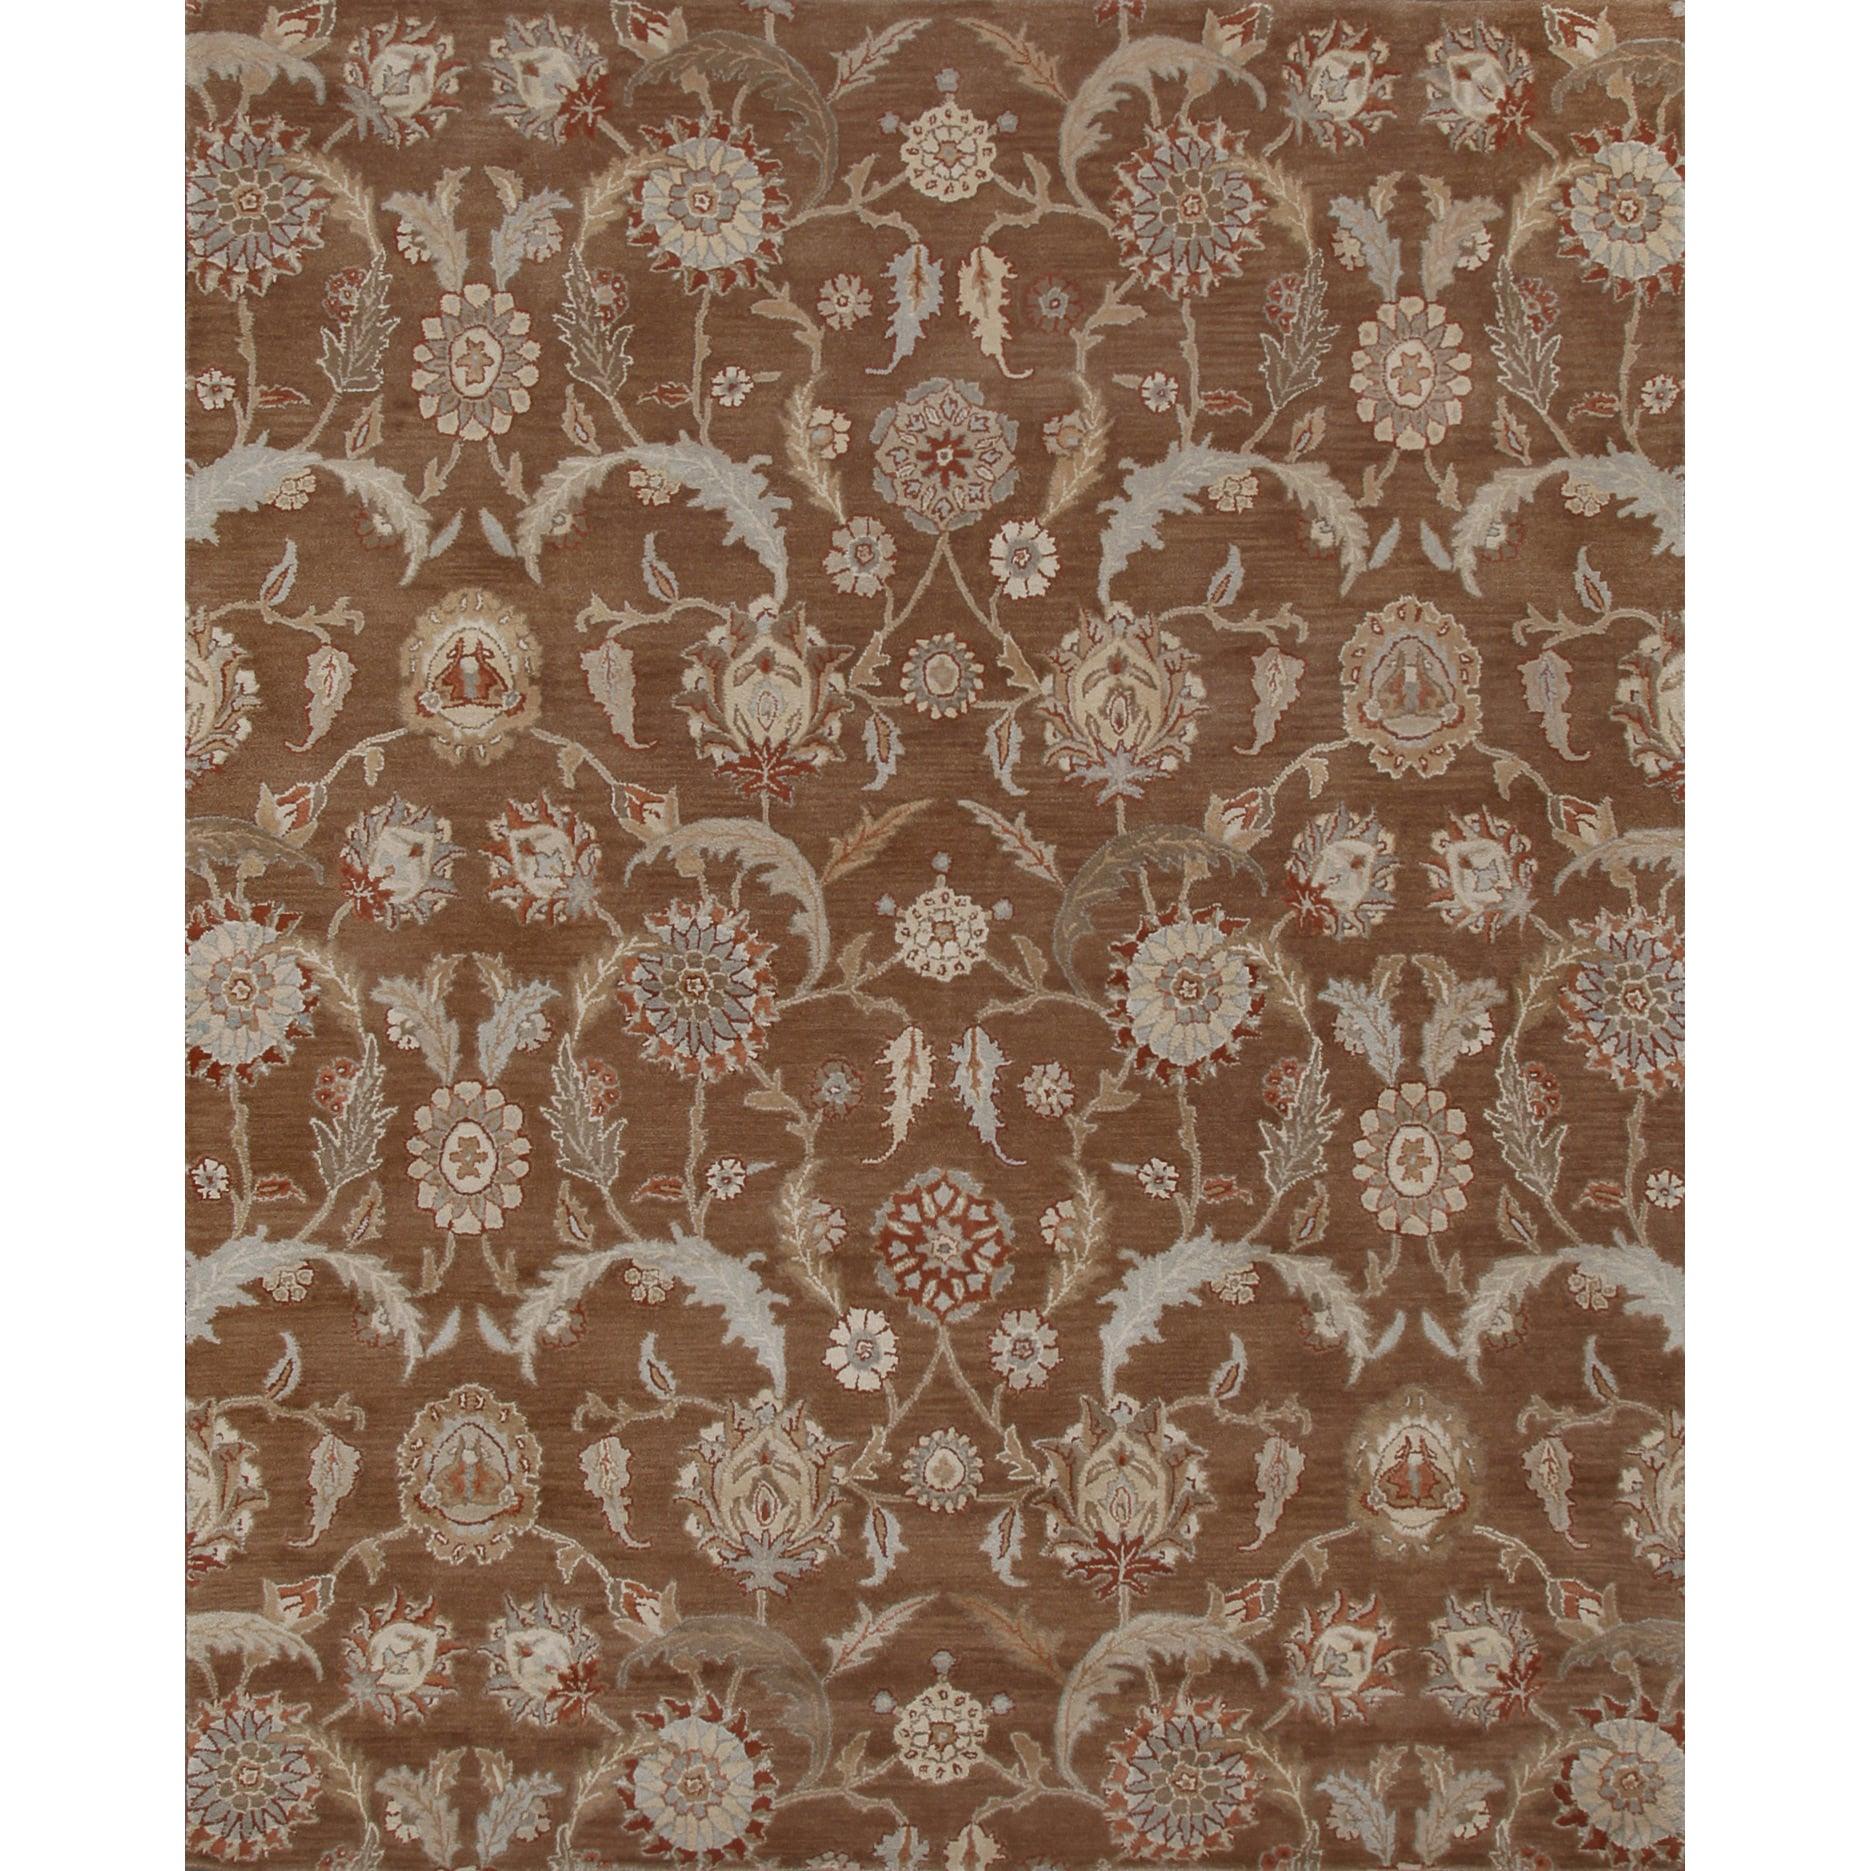 Handmade Kera Transitional Brown Rug (8' x 10') (Brown), ...